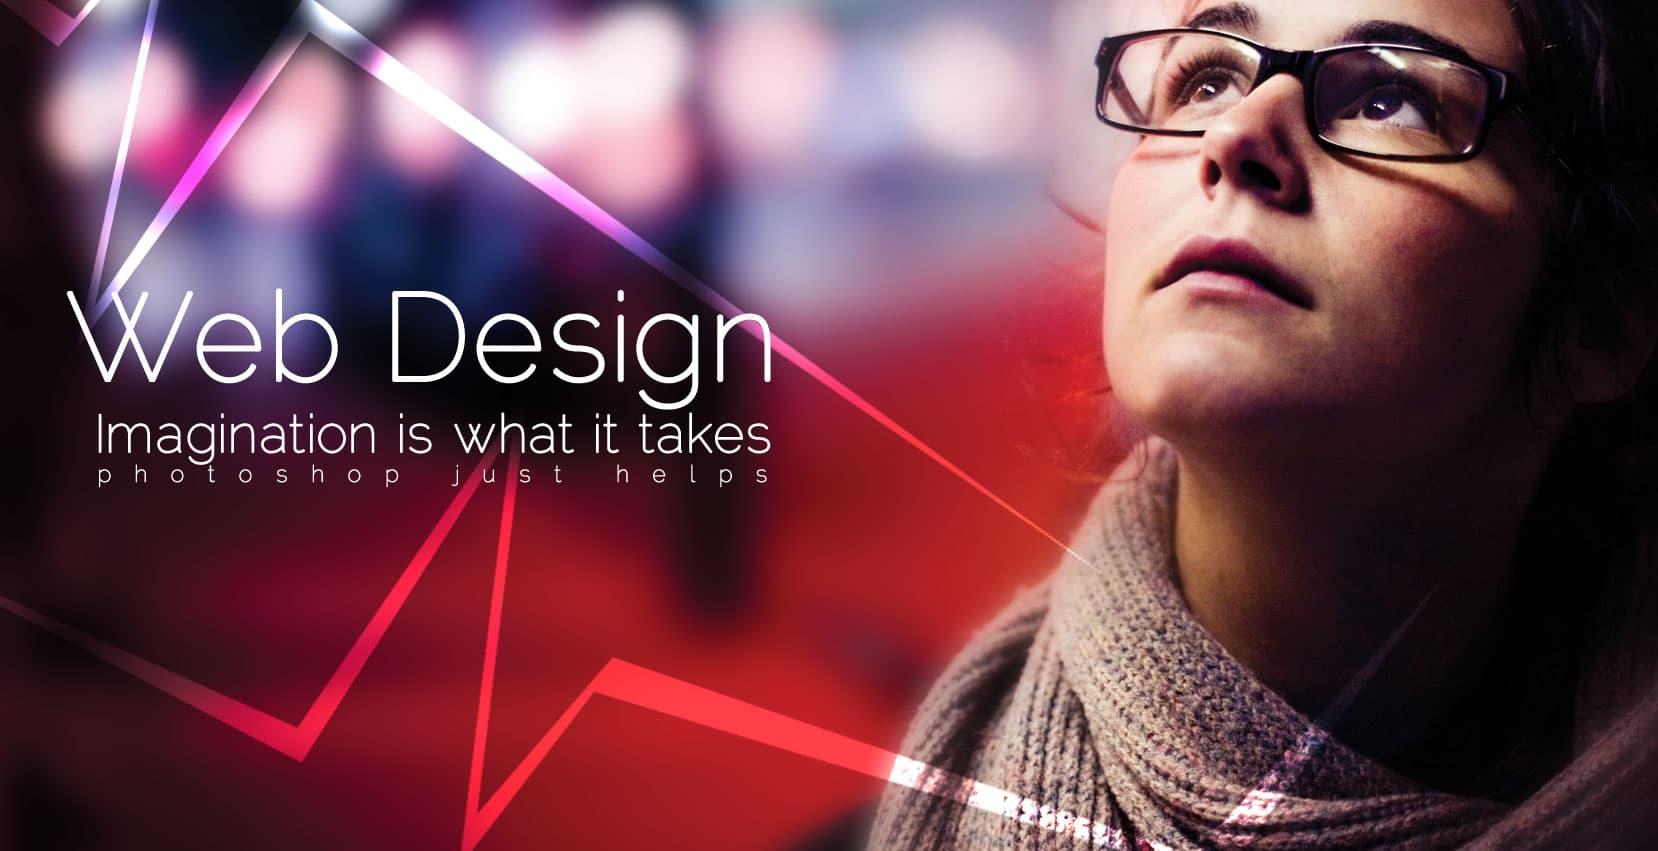 webdesign_mooc